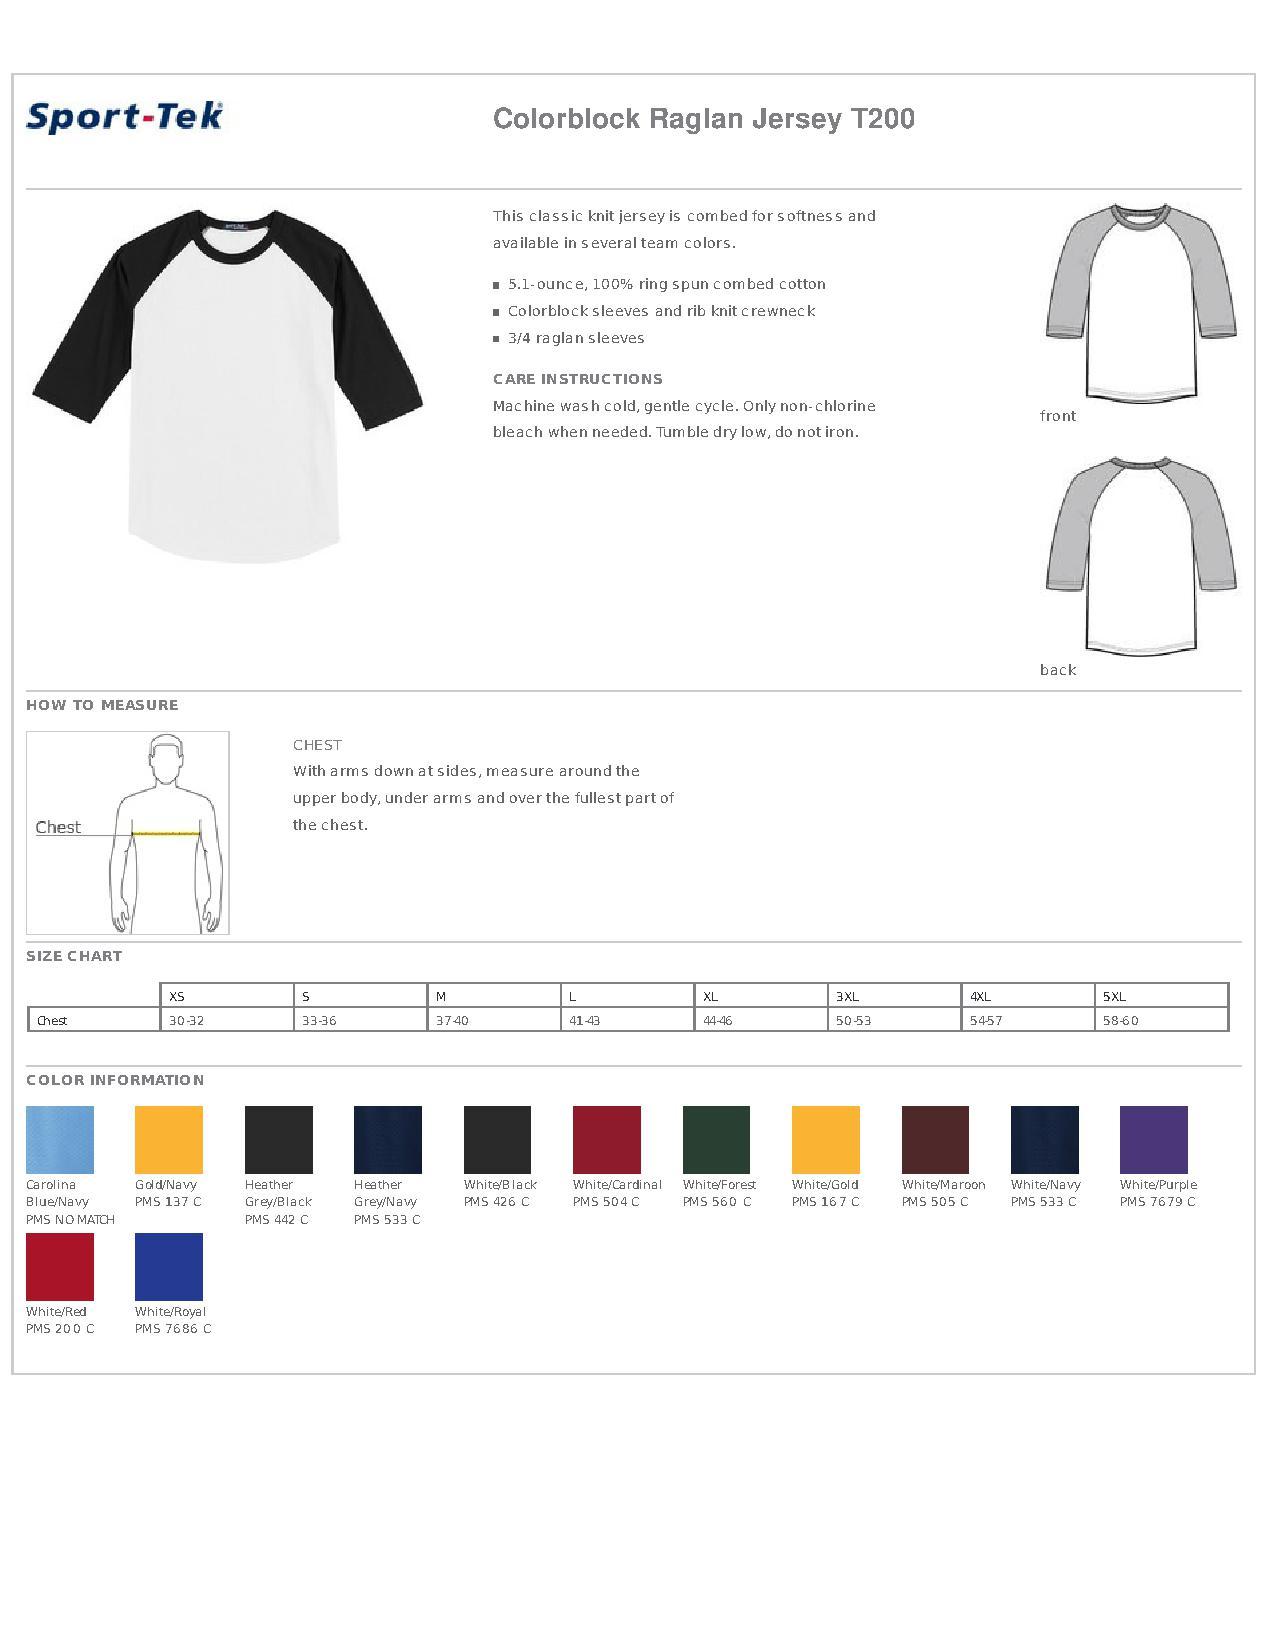 Sport Tek T200 Colorblock Raglan Jersey